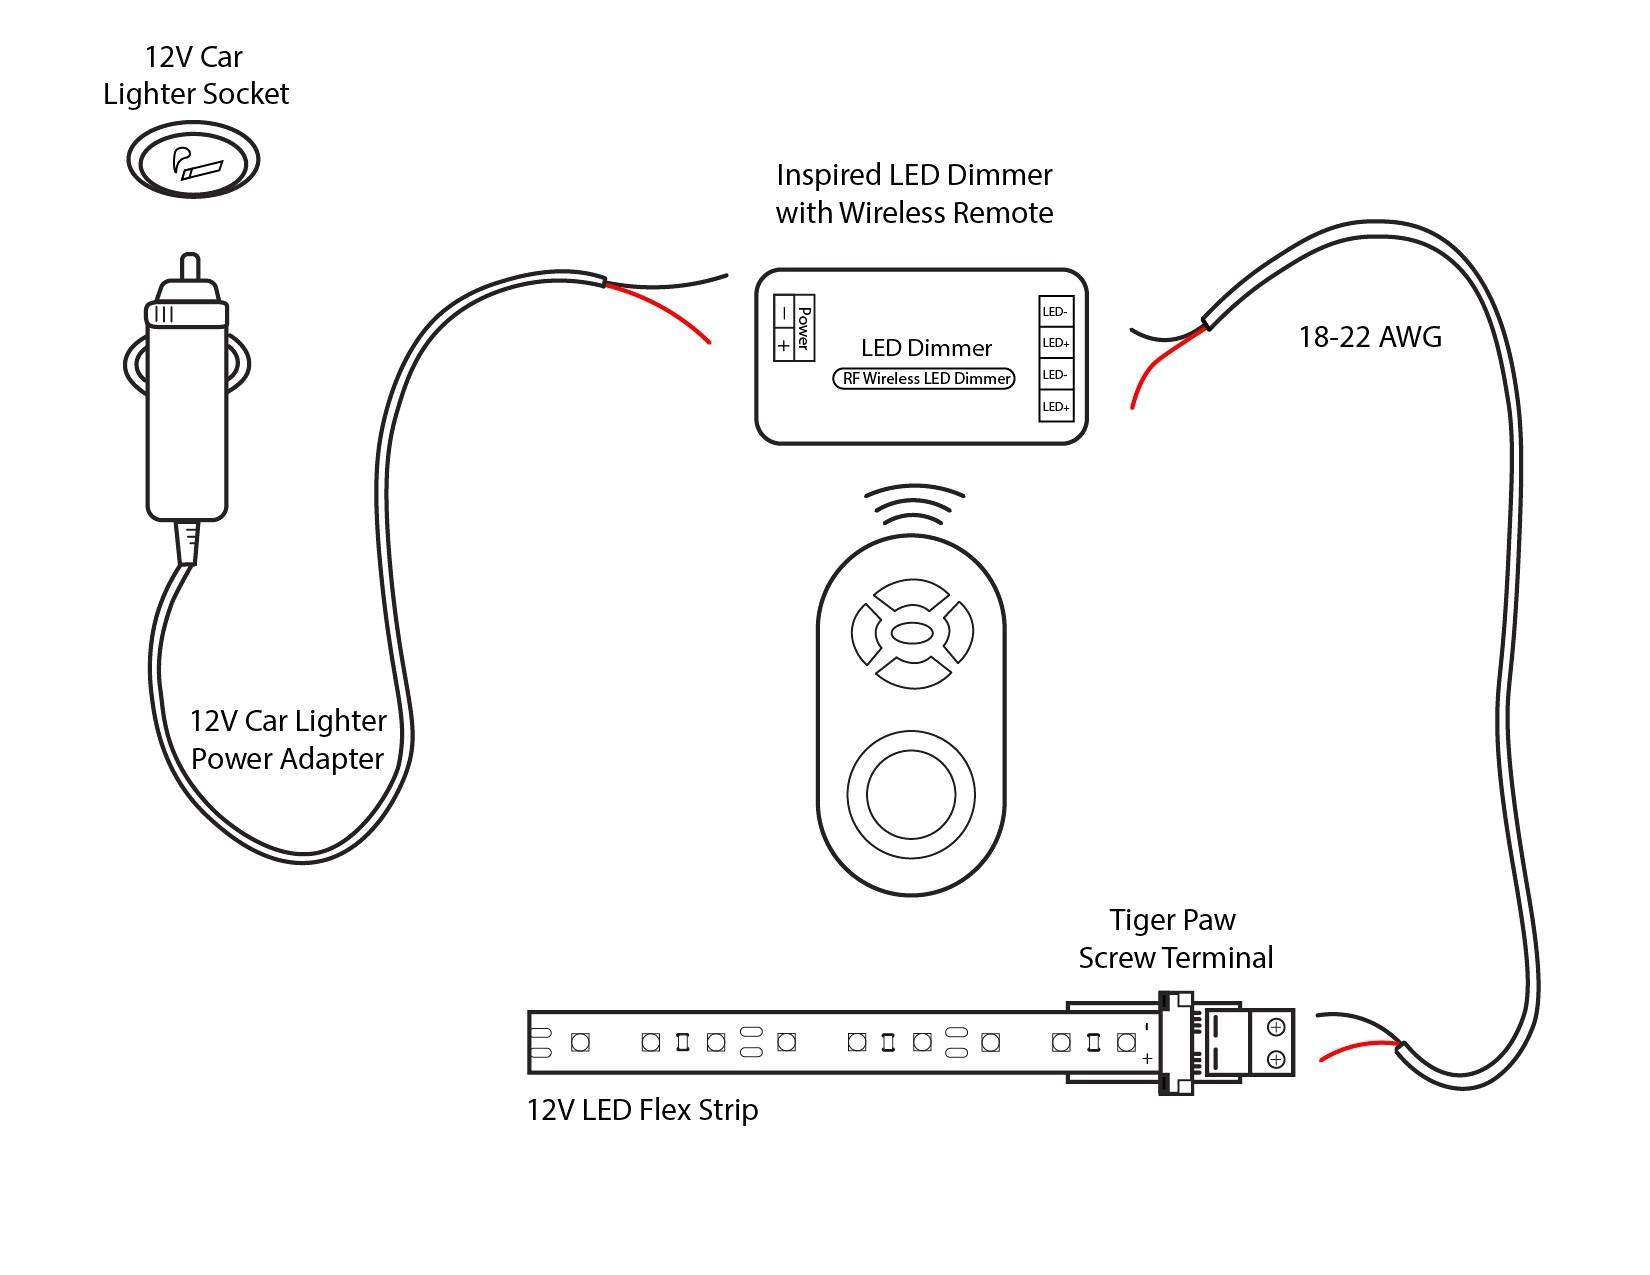 Wiring Diagram For Car Cigarette Lighter